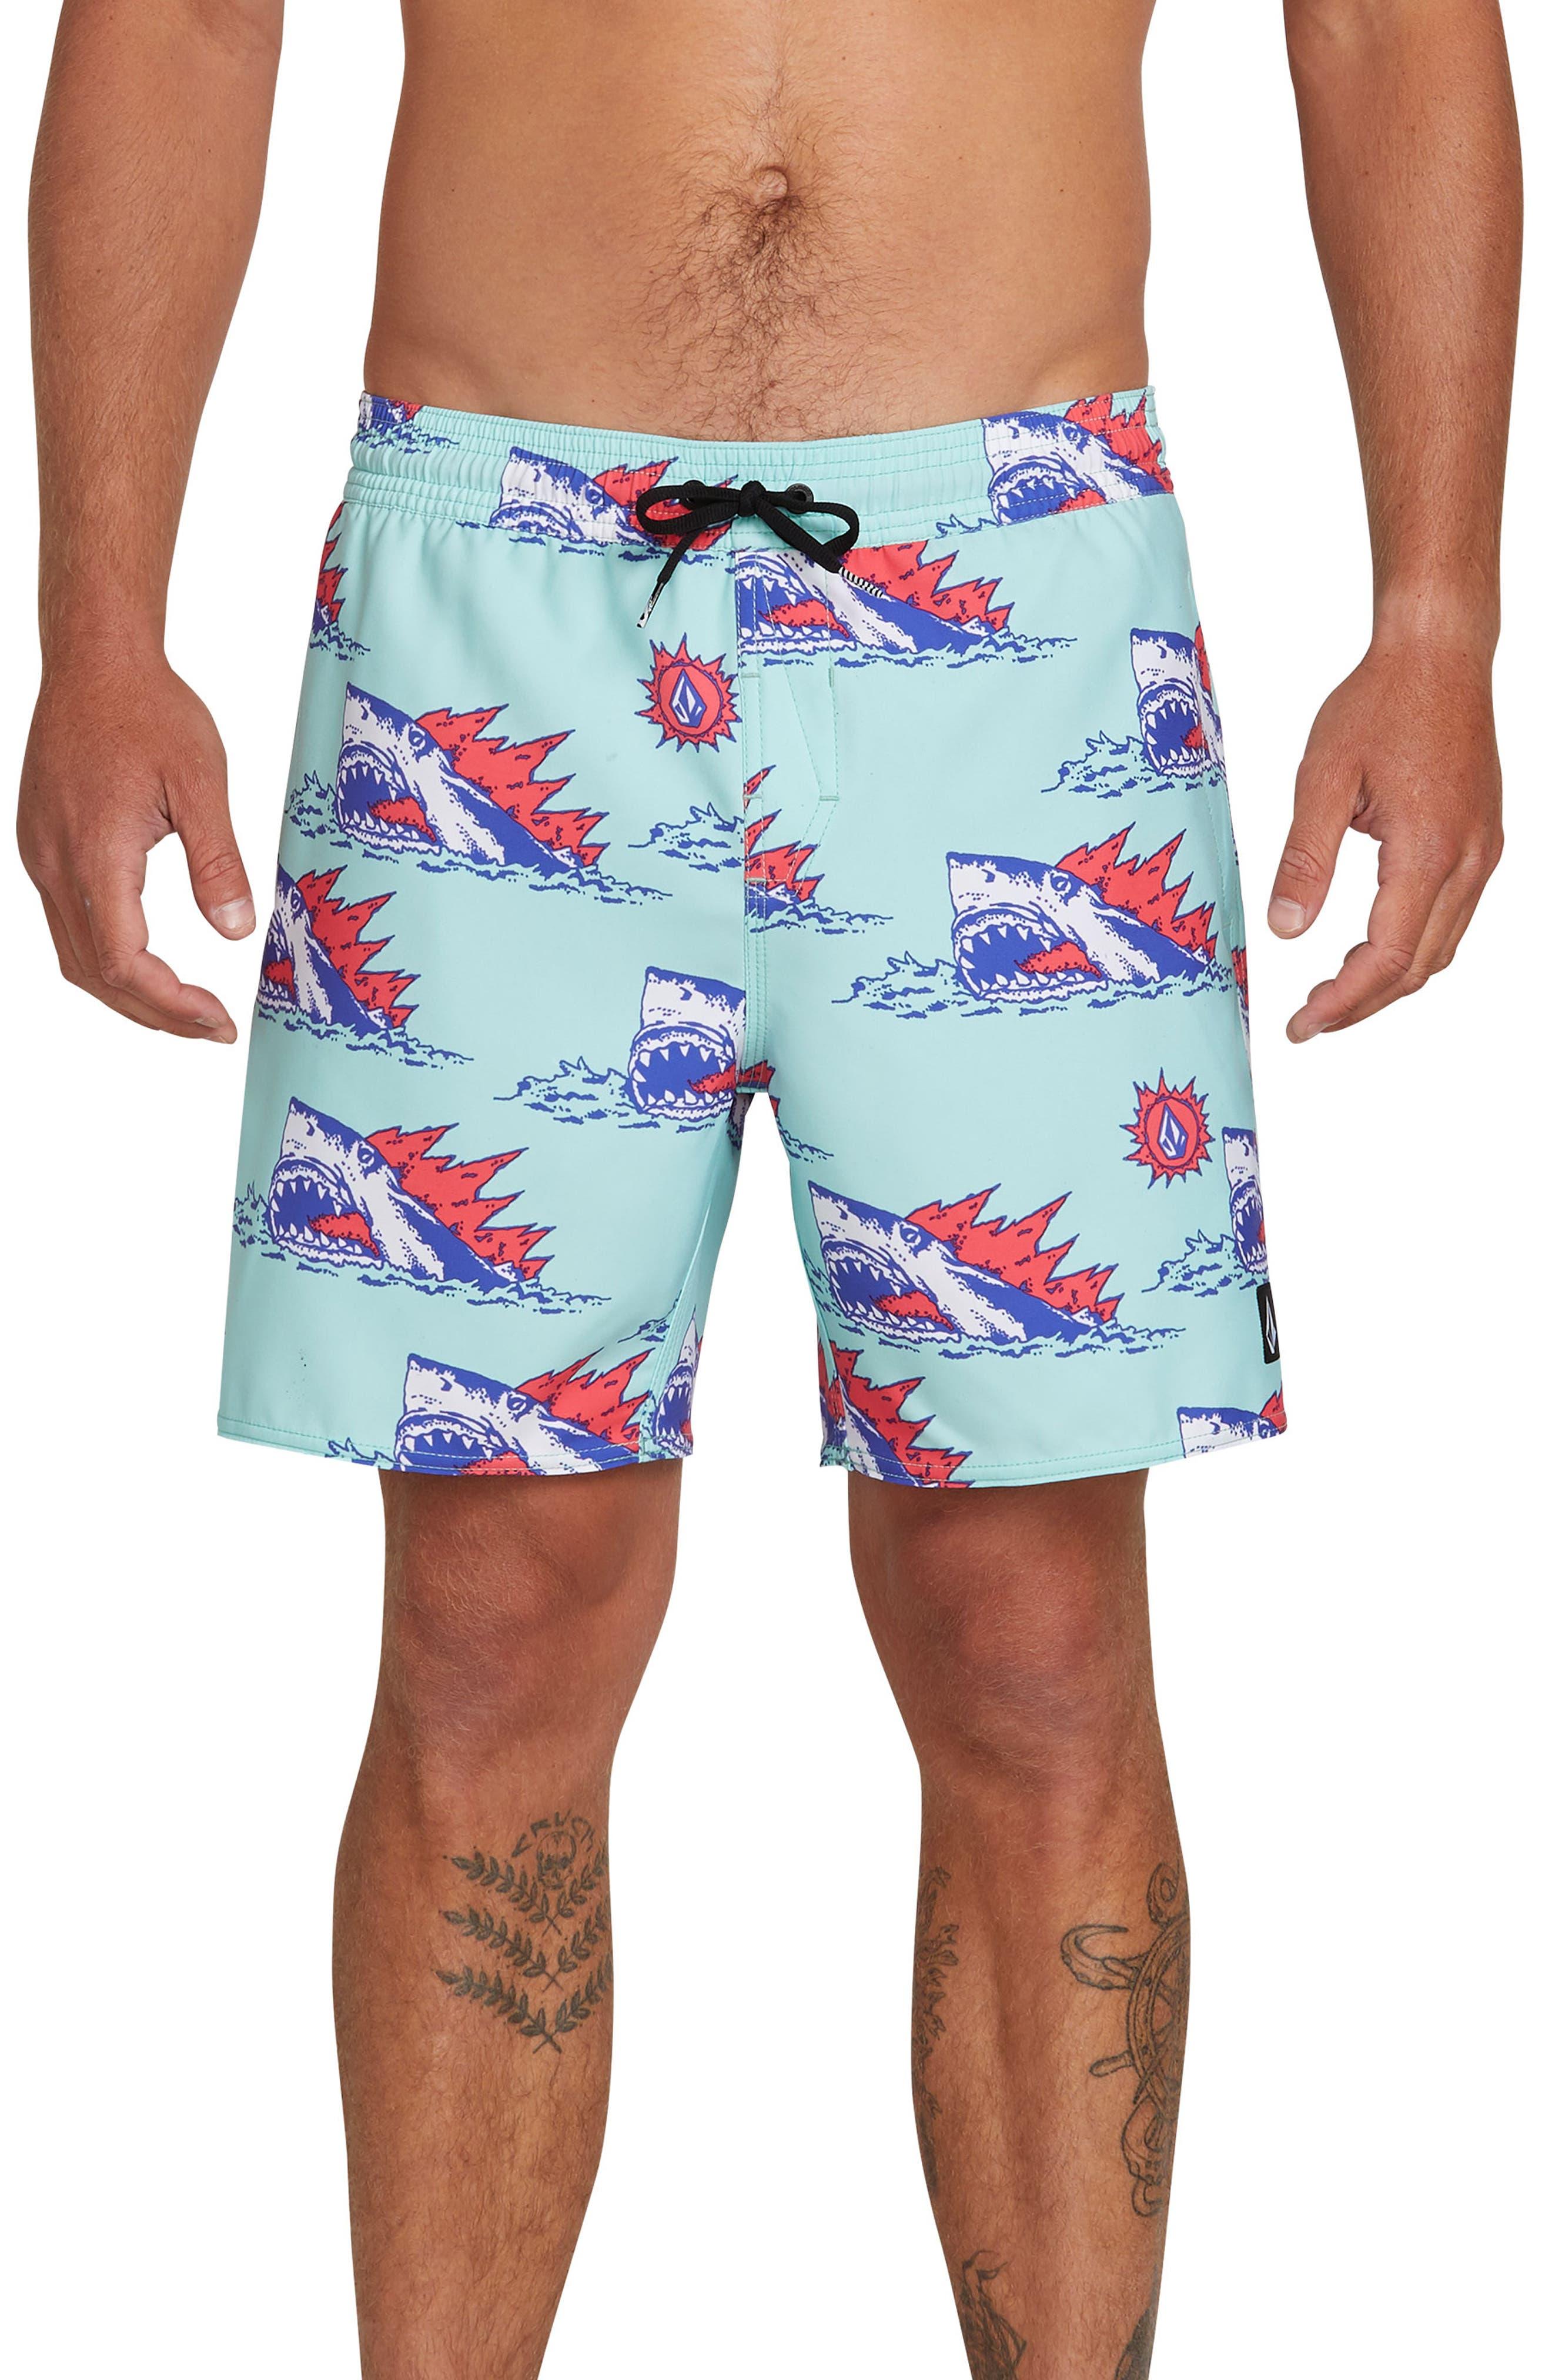 9570974ddd Volcom - Men's Swimwear and Beachwear